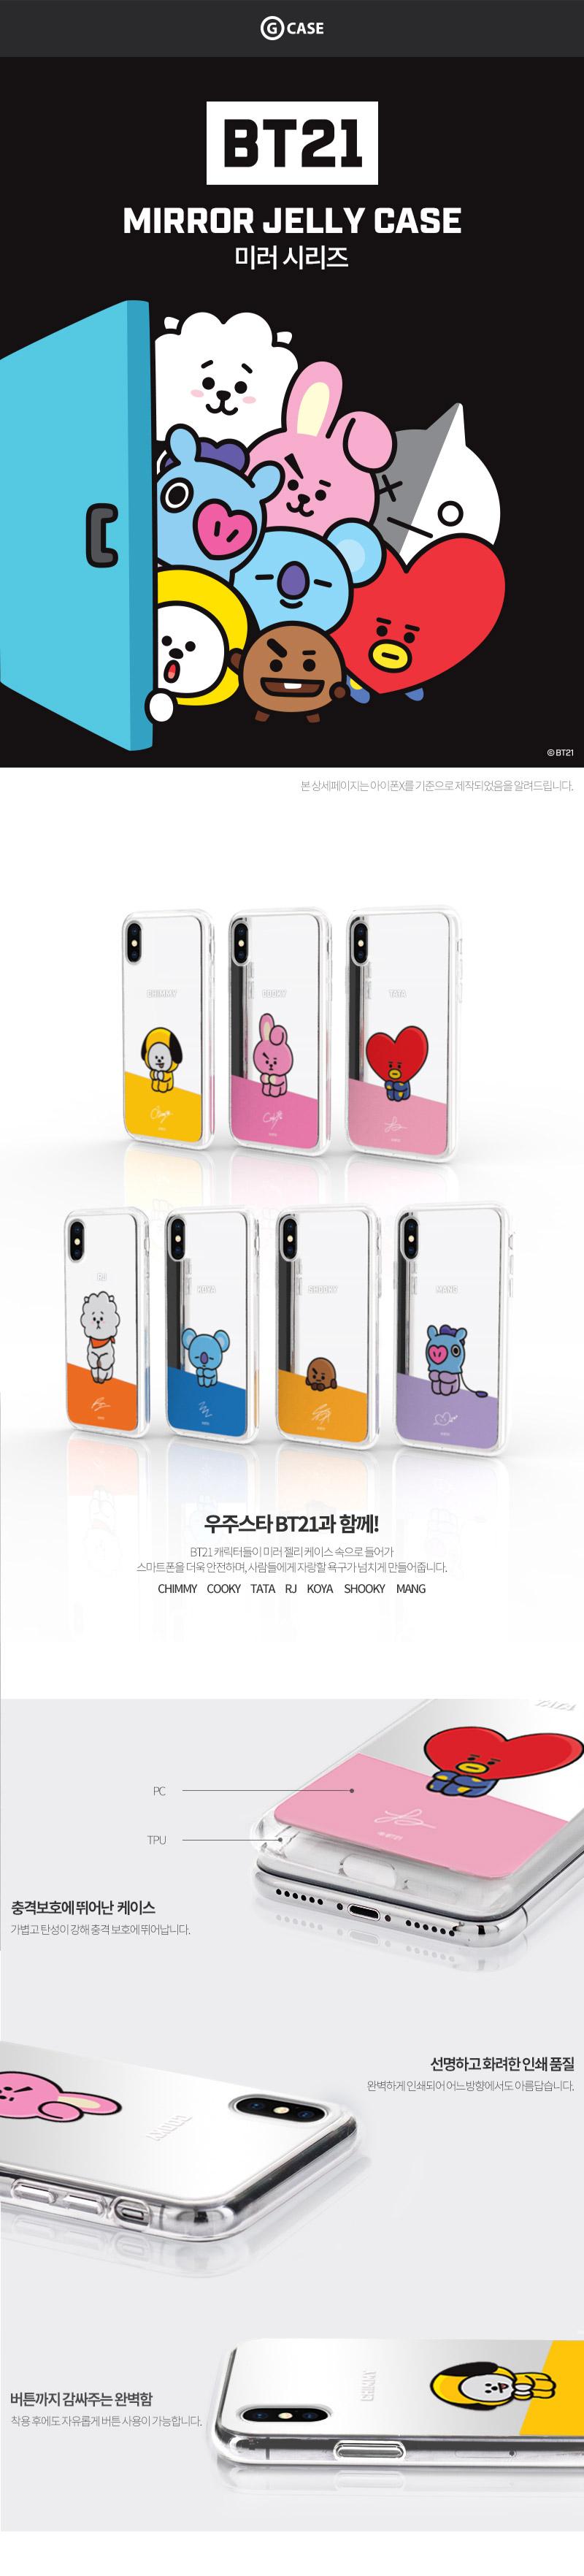 competitive price b7c75 61554 [BT21] Mirror Jelly Phone Case